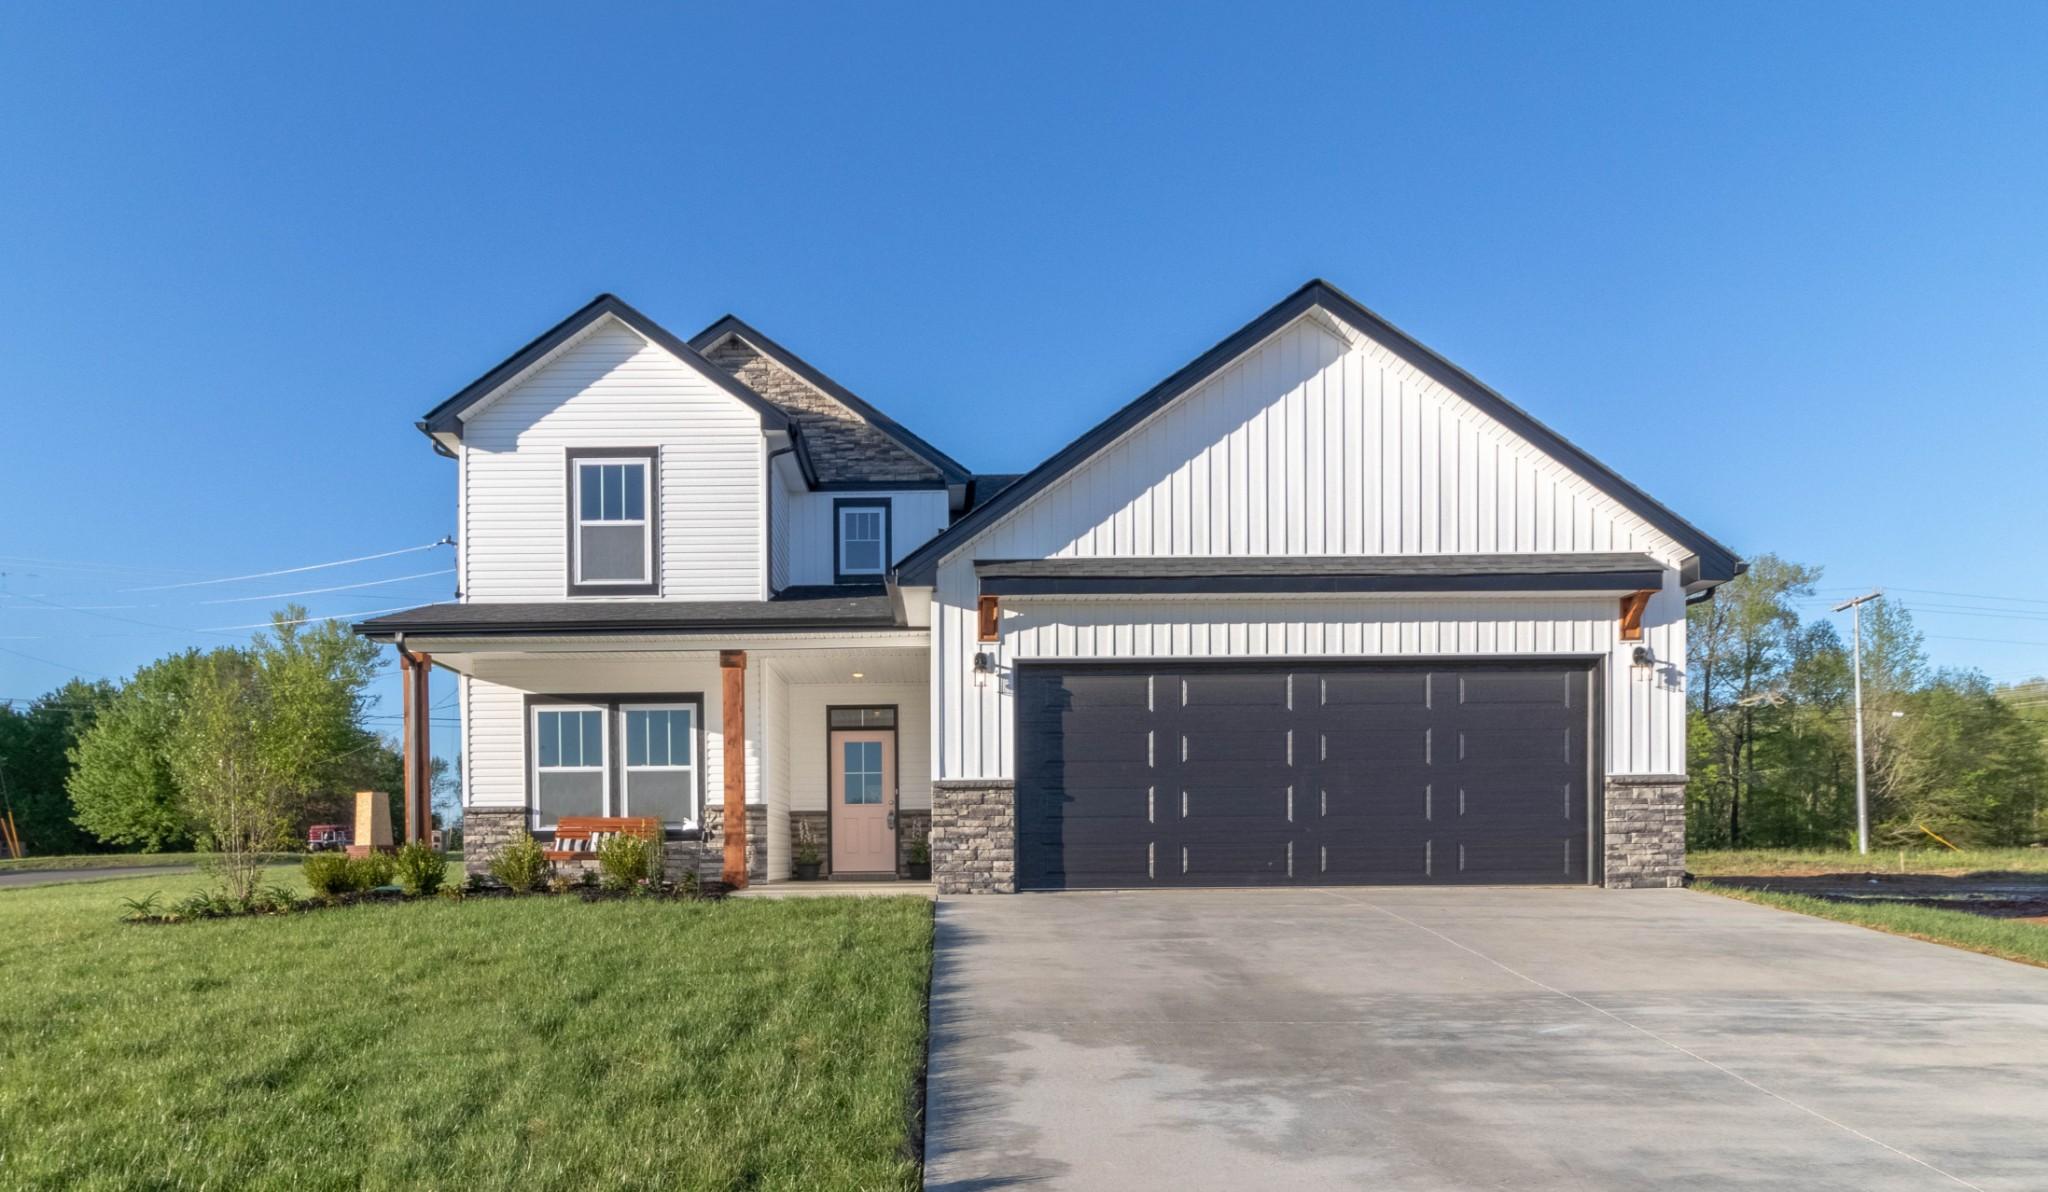 1 Reserve at Sango Mills, Clarksville, TN 37043 - Clarksville, TN real estate listing